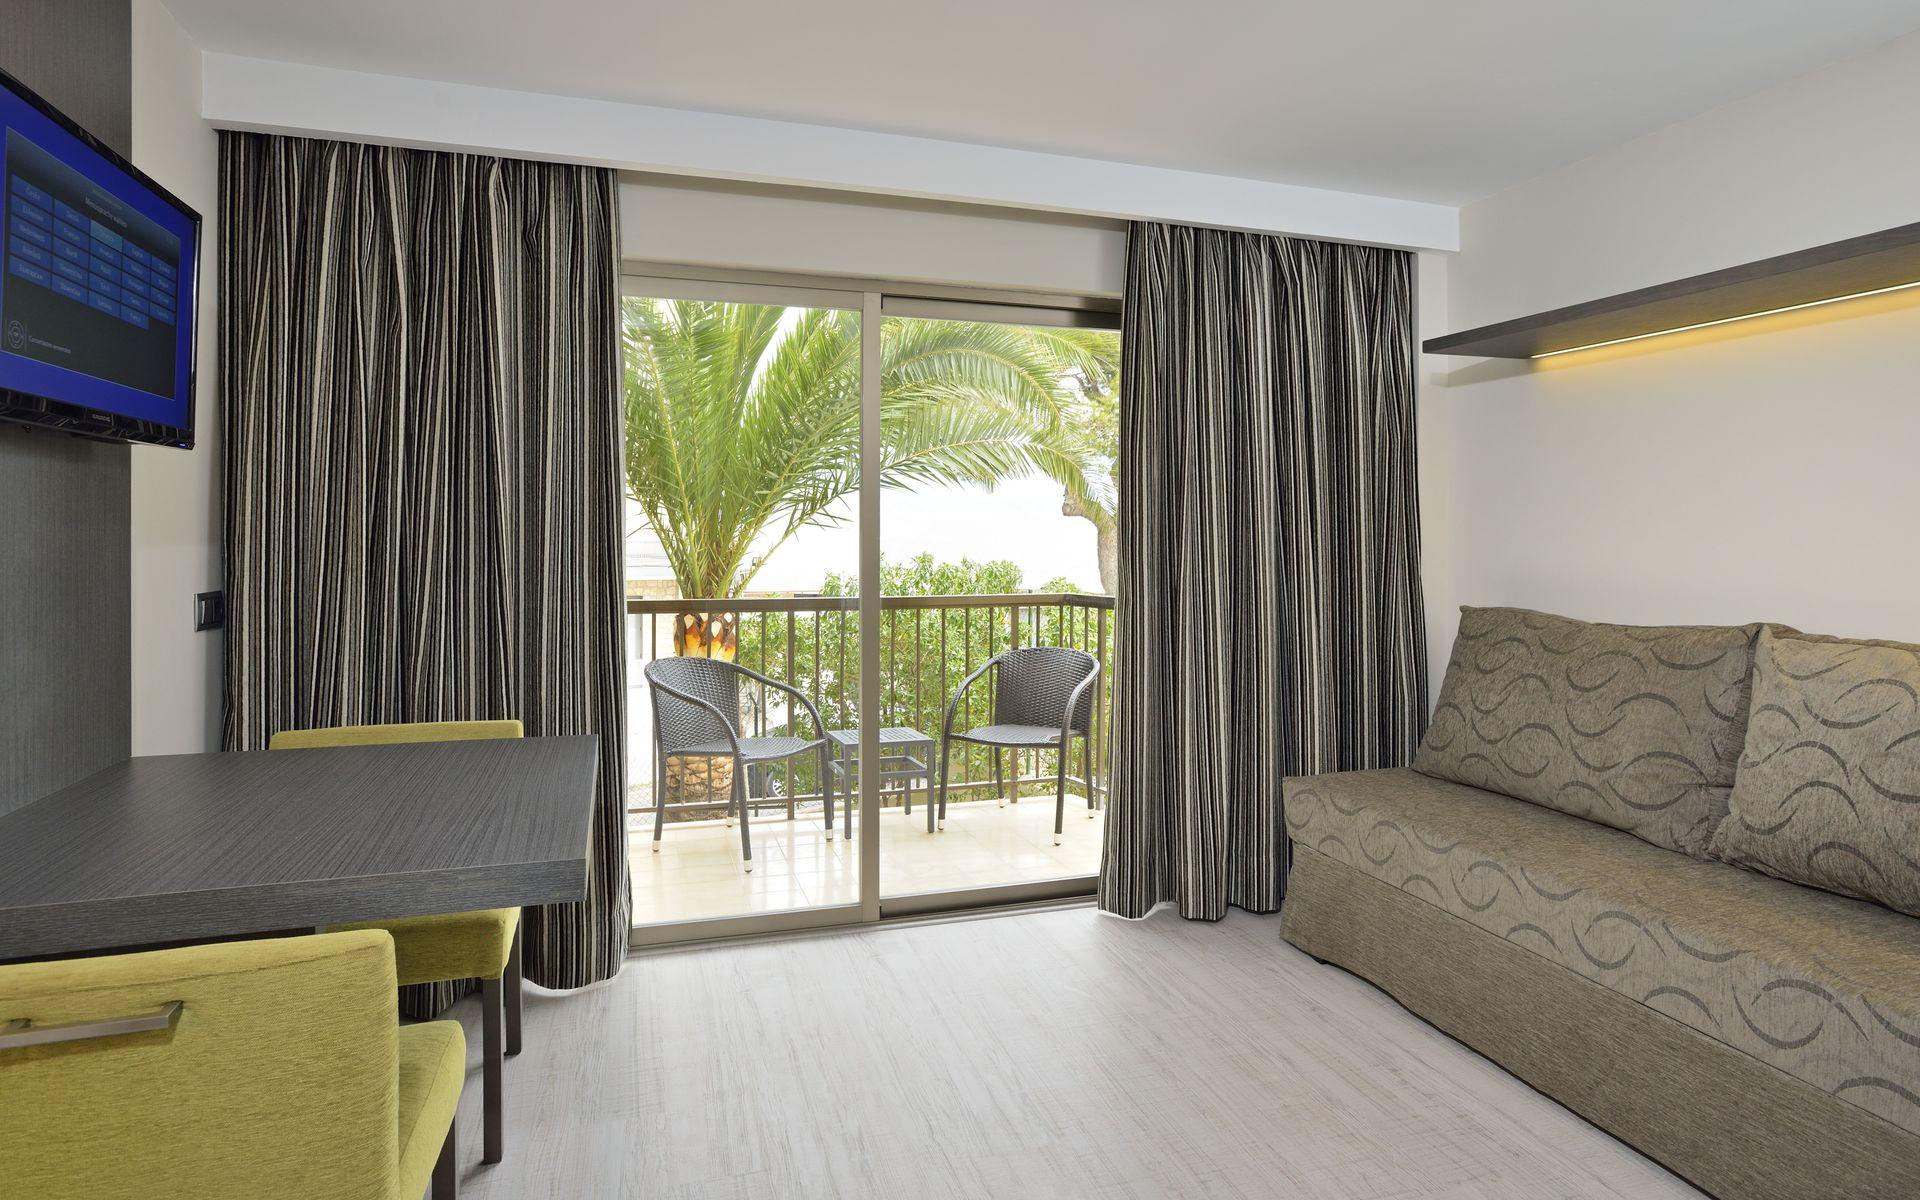 Intertur hotel hawaii mallorca suites en palmanova - Television pequena plana ...